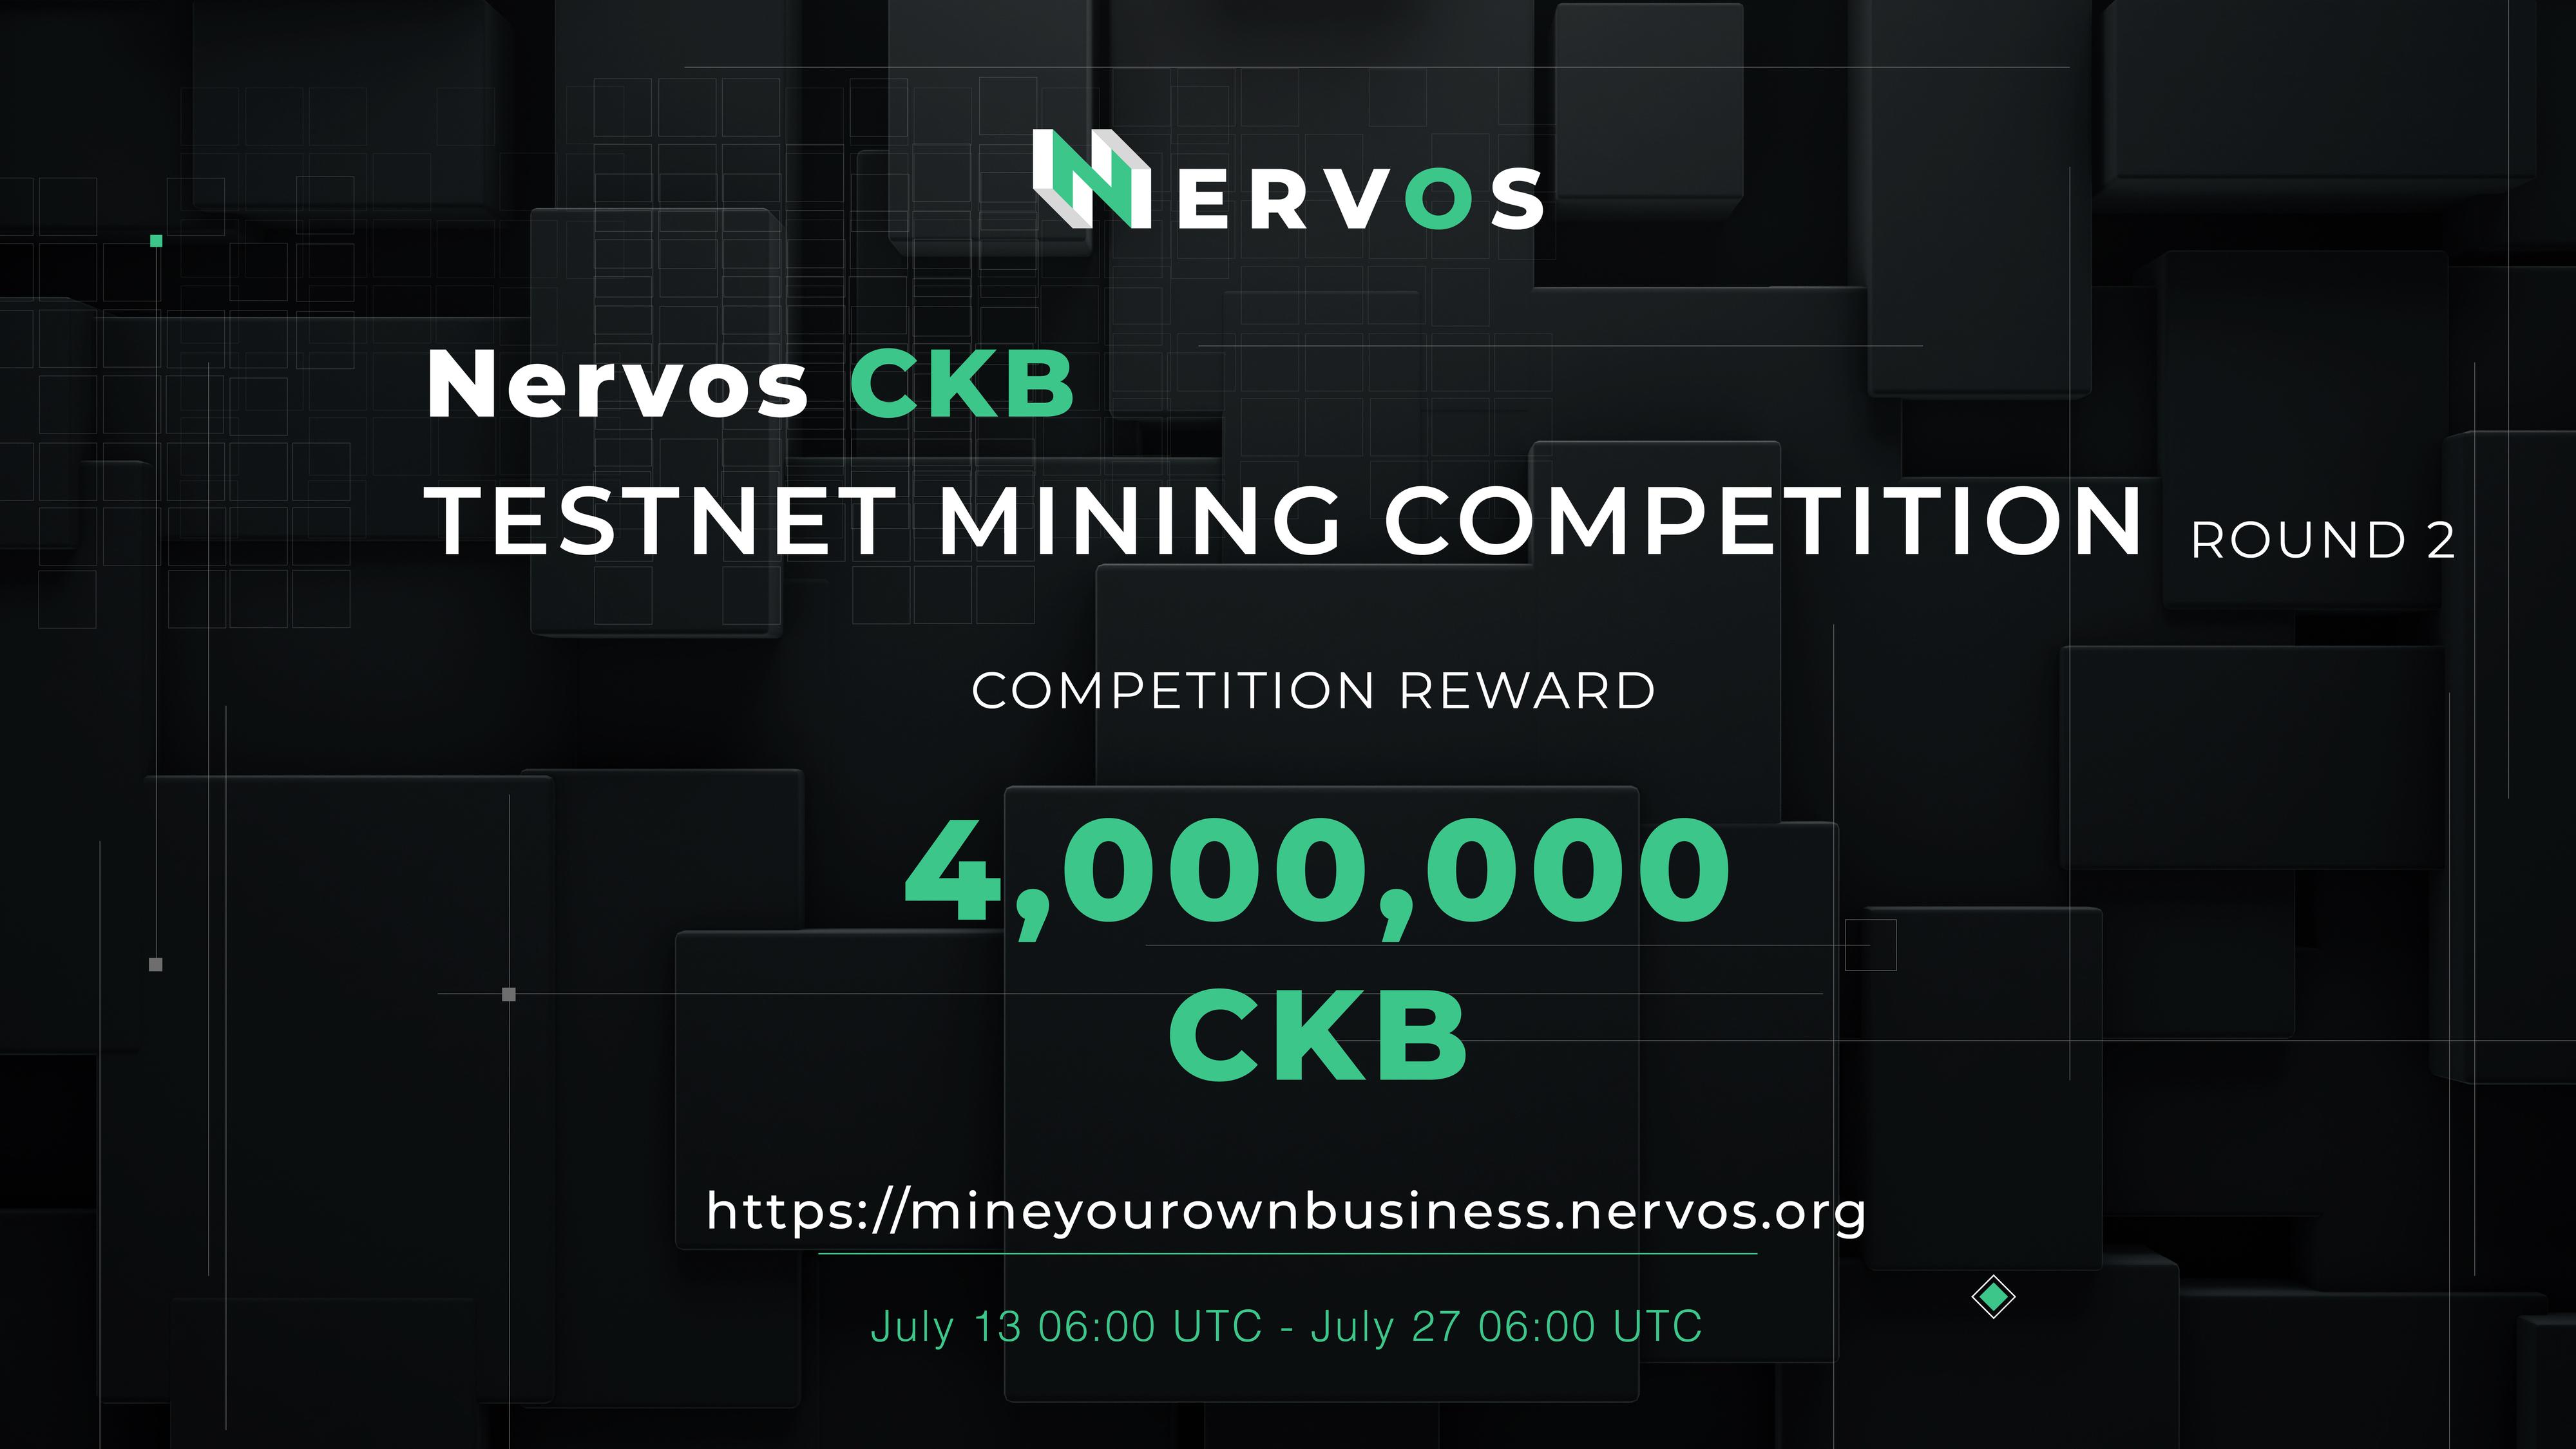 CKB Testnet Mining Competition Round 2: Earn 4,000,000 CKB